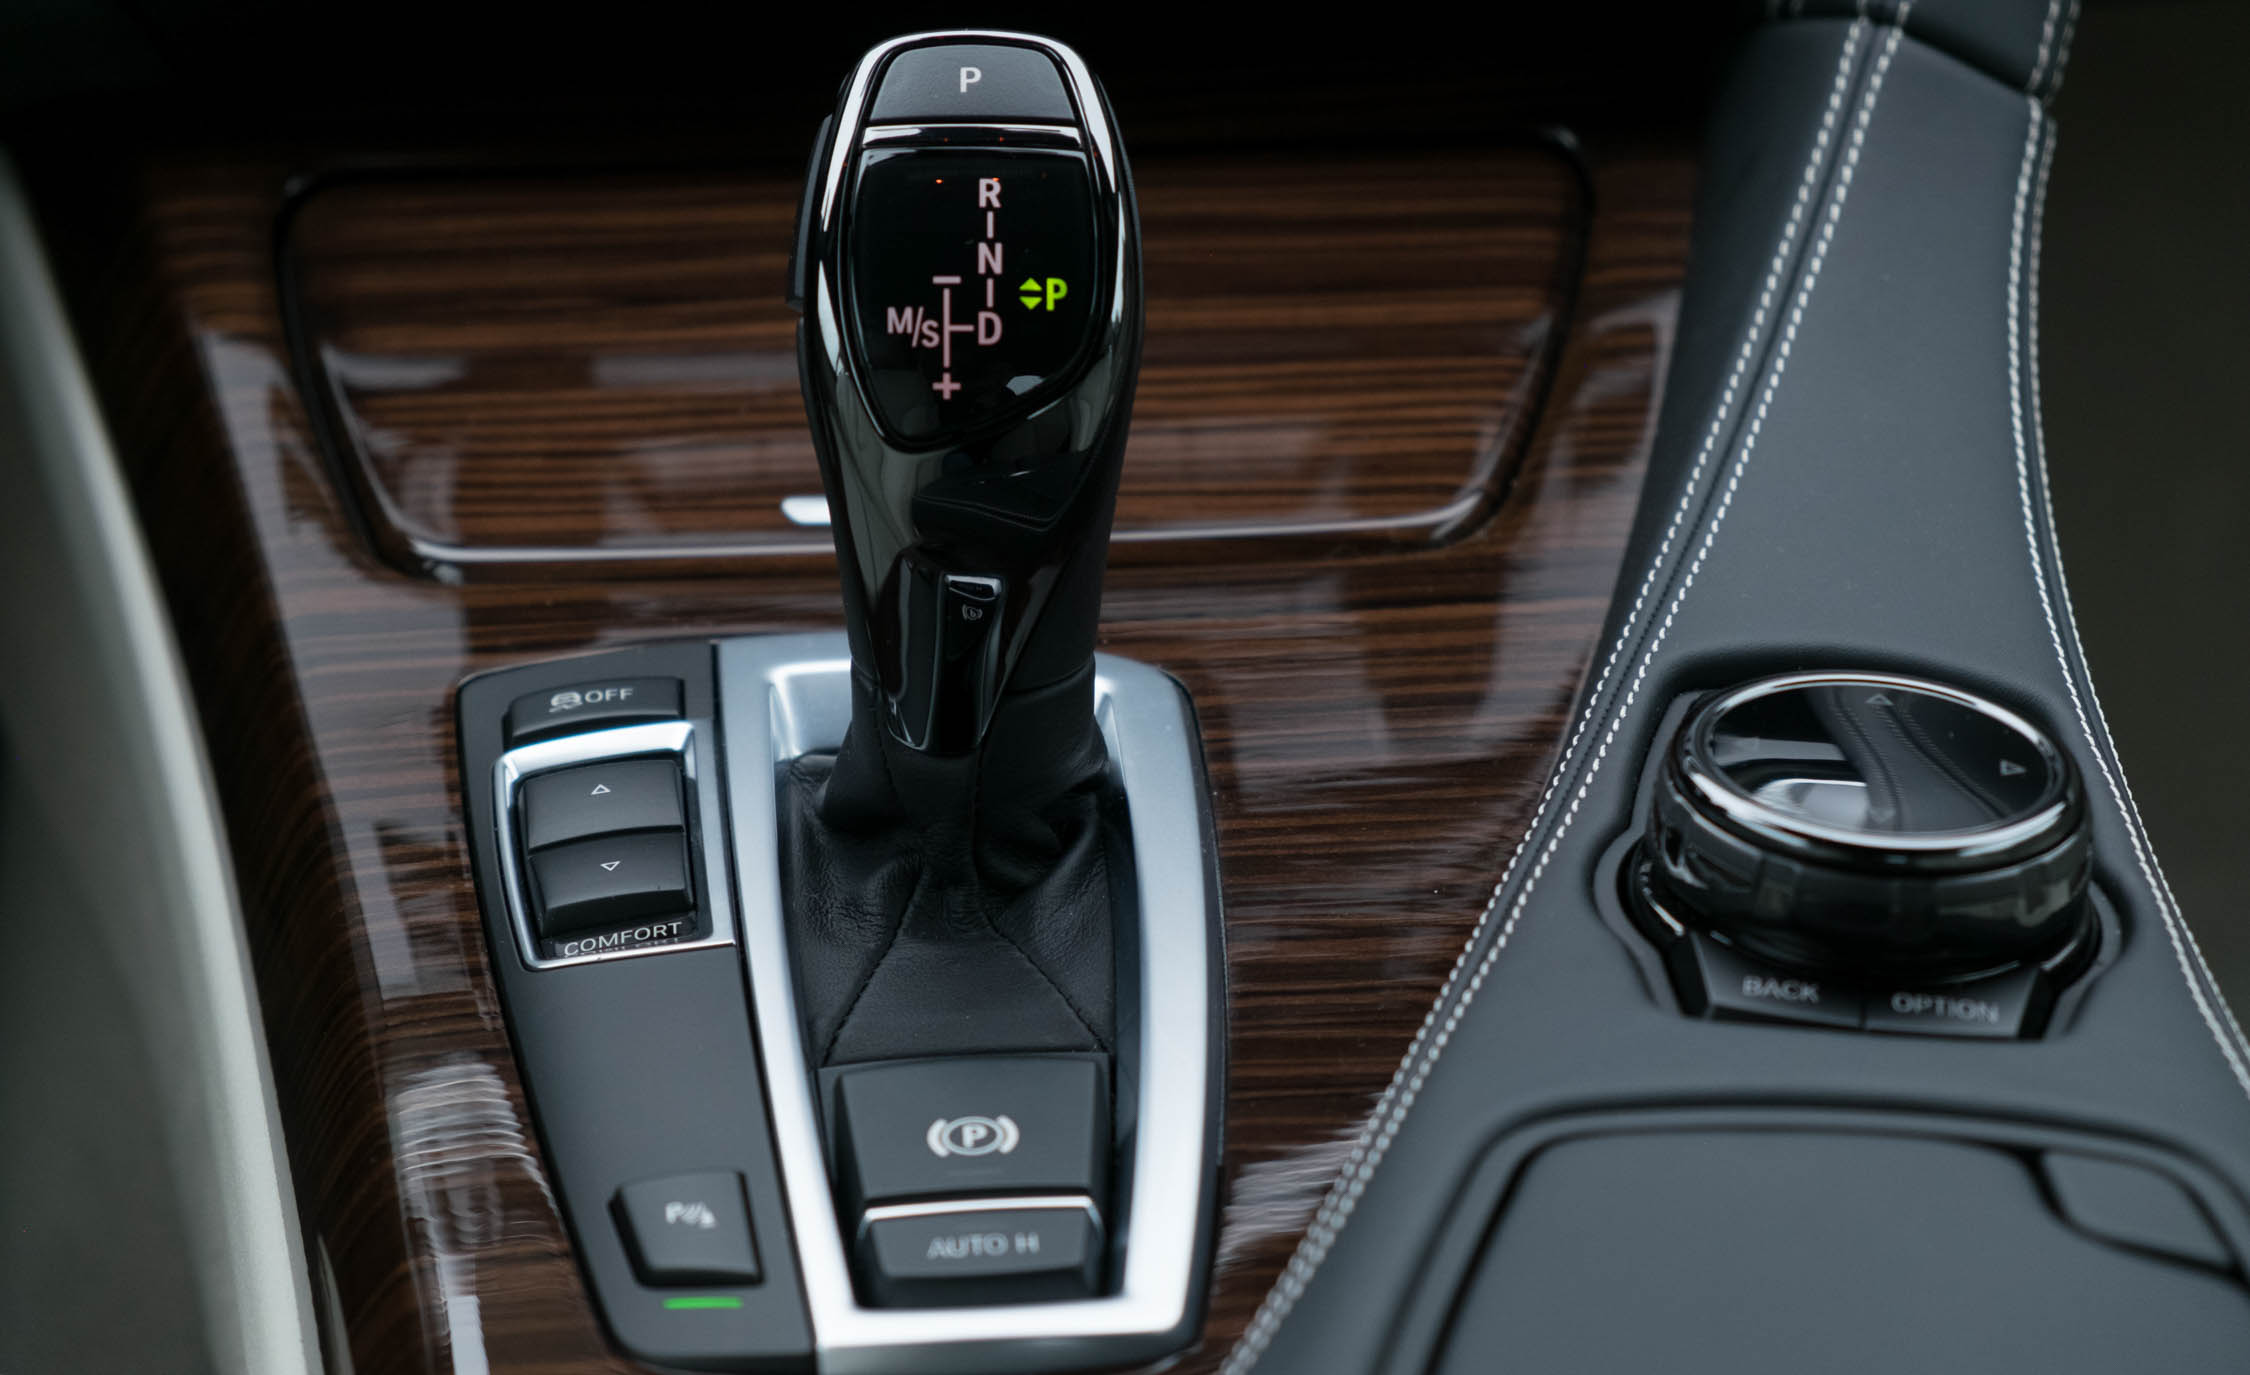 2016 BMW 640i Convertible Interior Gear Shift Knob